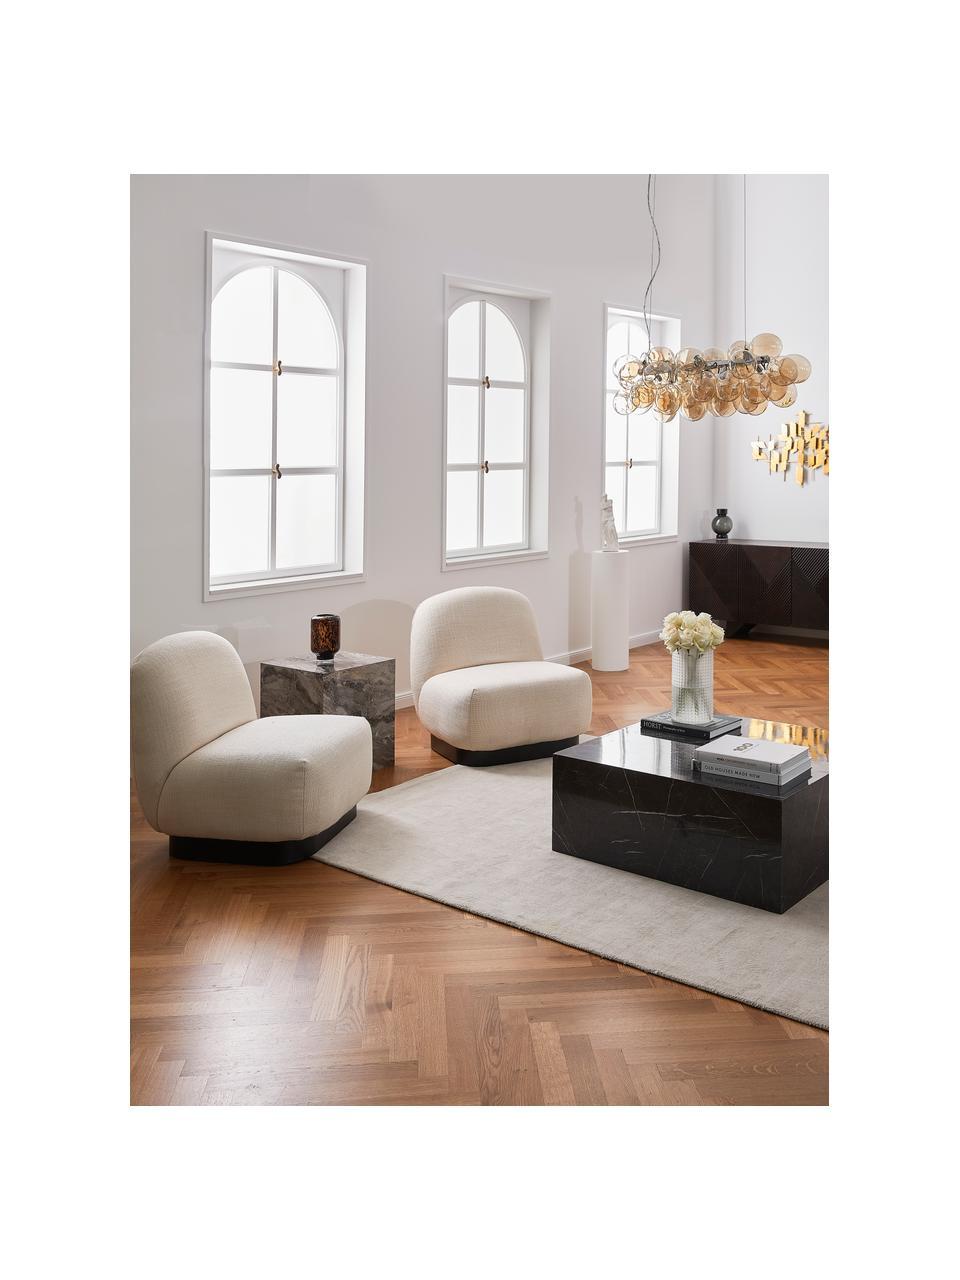 Fauteuil Elsie in crèmewit, Bekleding: polyester, Frame: multiplex, massief eucaly, Voet: gepoedercoat metaal, Geweven stof crèmewit, B 77 x D 84 cm